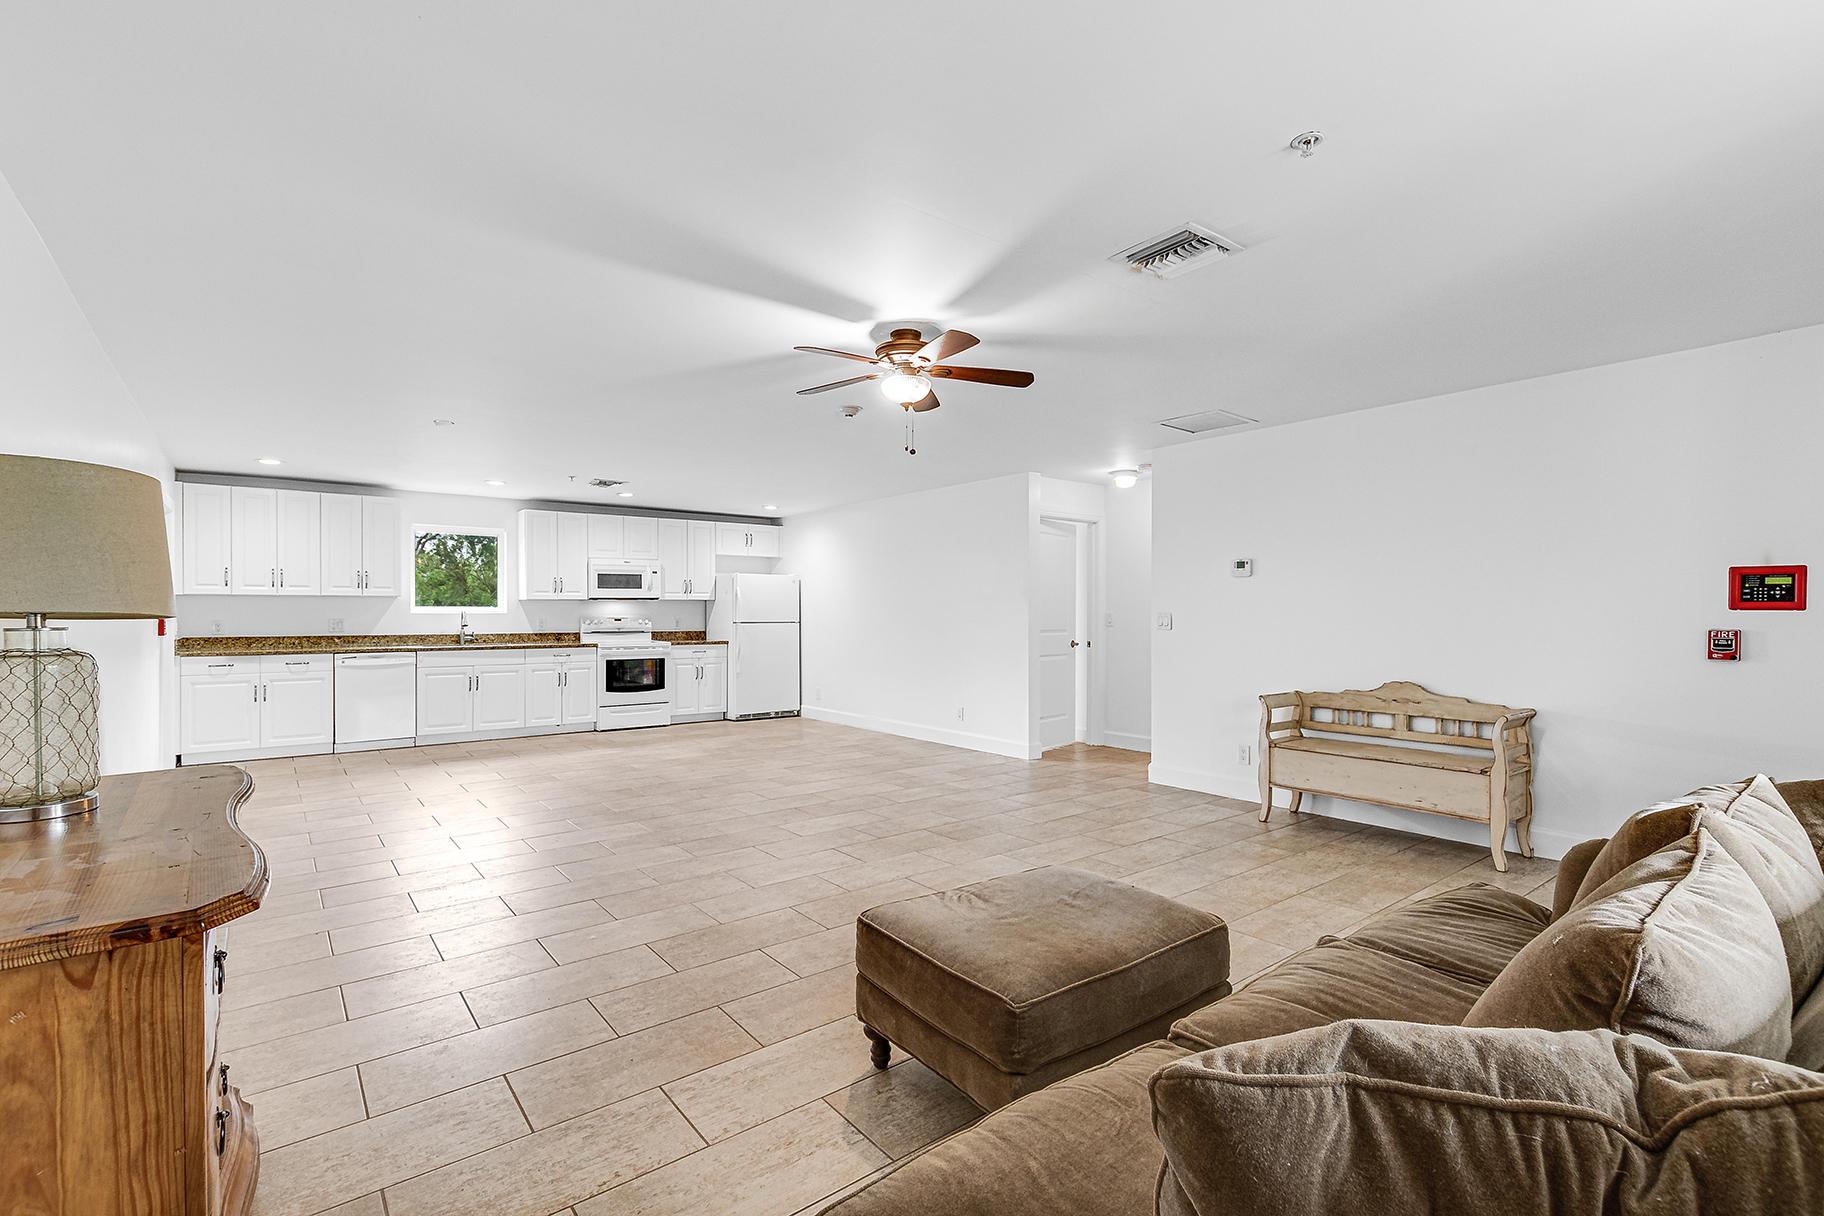 Groom's Quarters/Living area